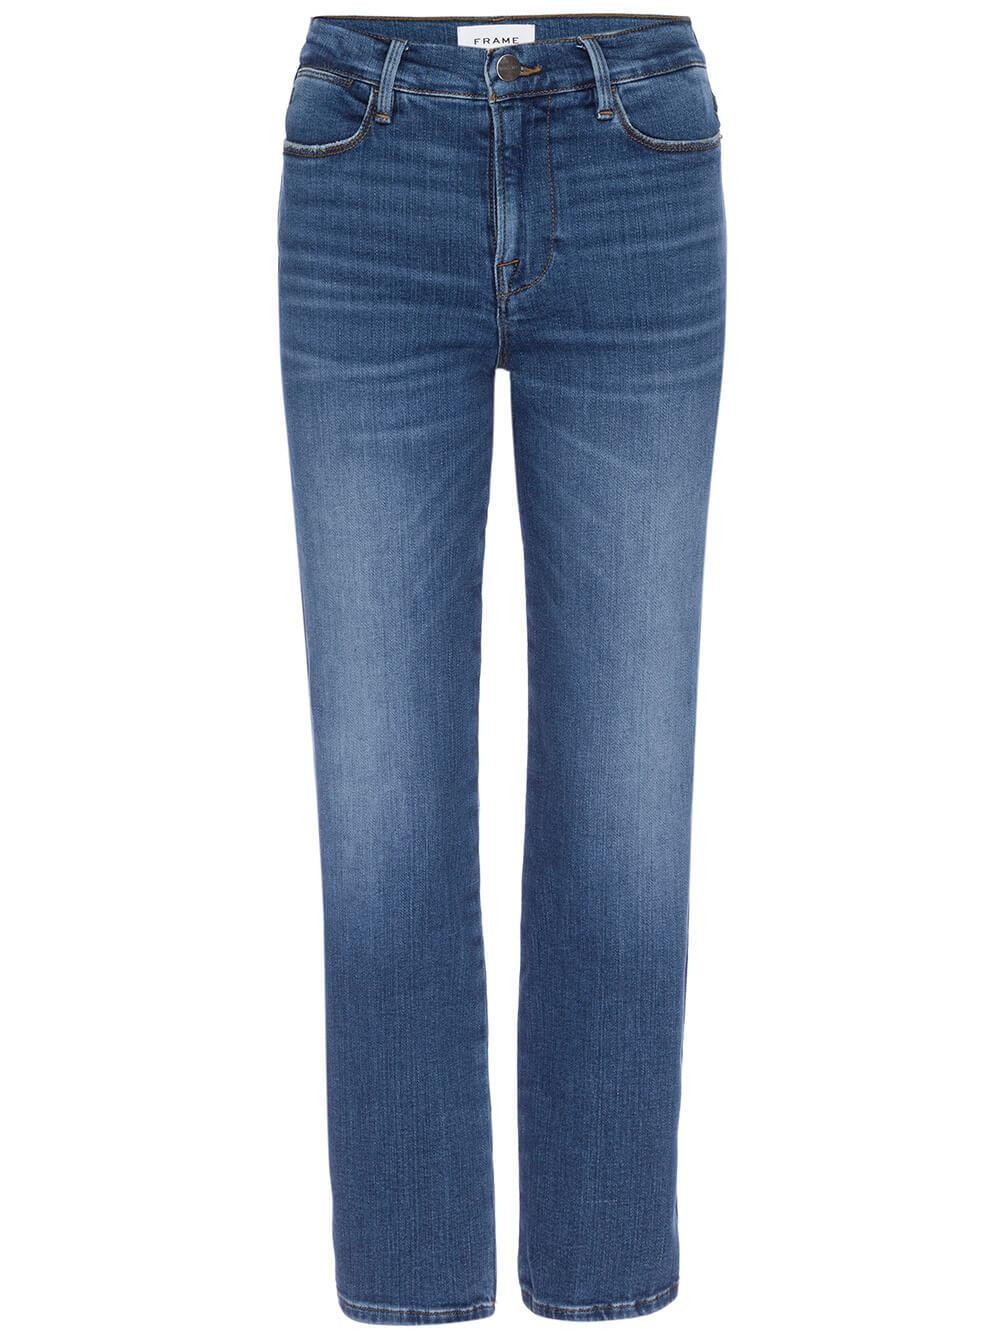 Le High Straight Leg Item # LHSTTN793